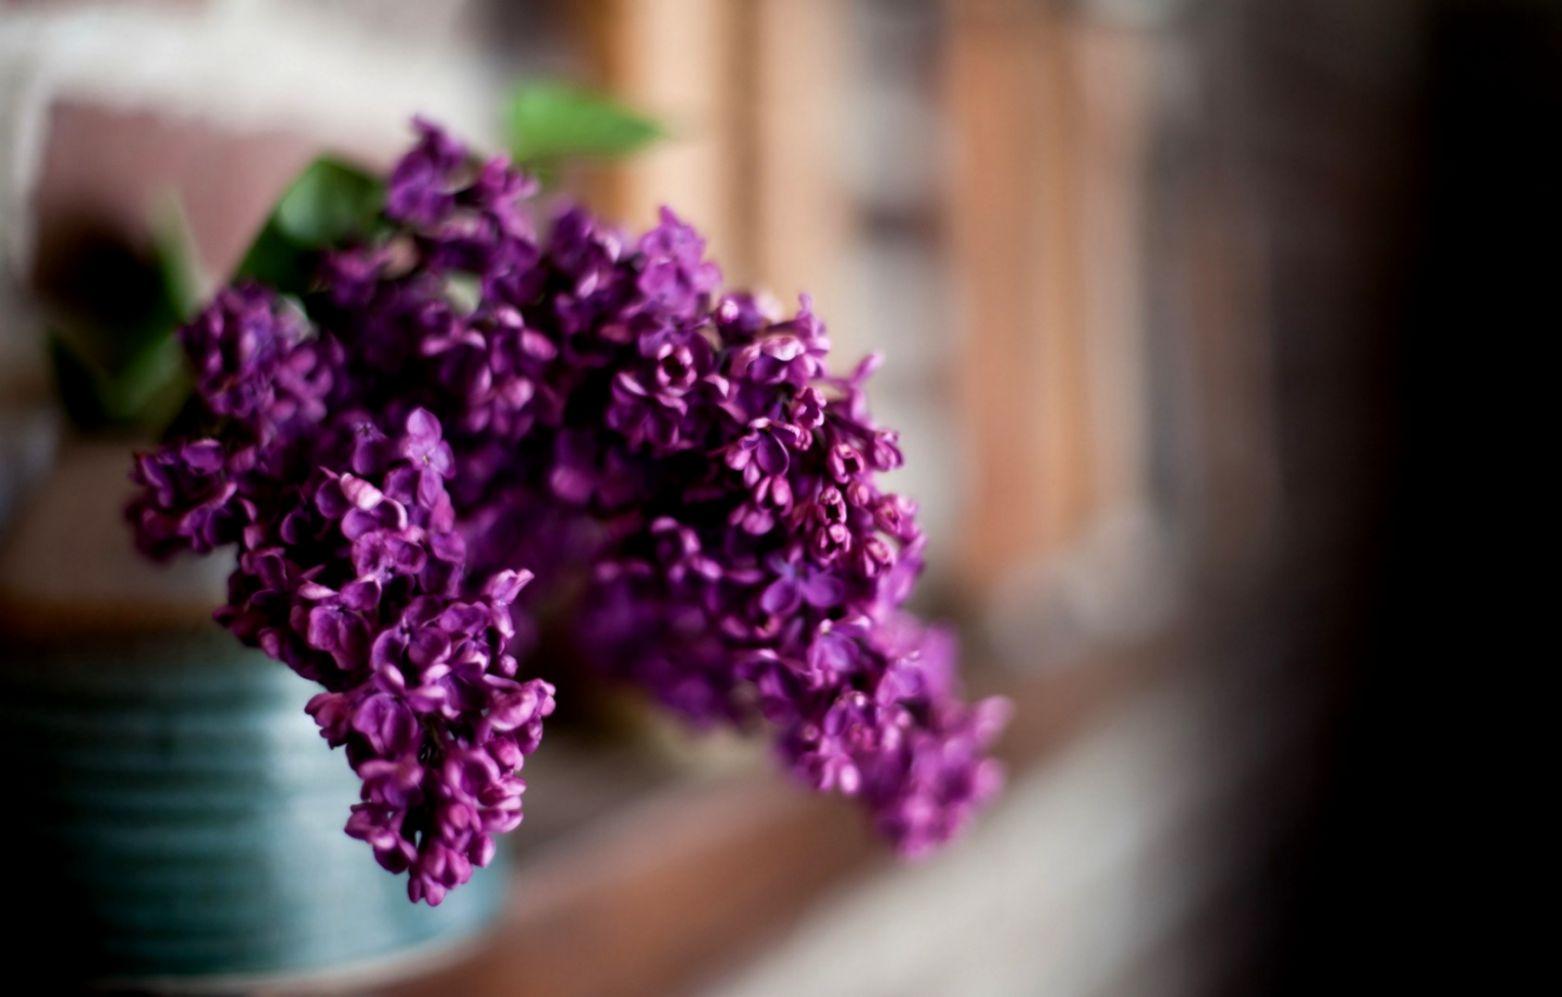 Close Up Flower Purple Macro Hd Wallpaper One Wallpapers